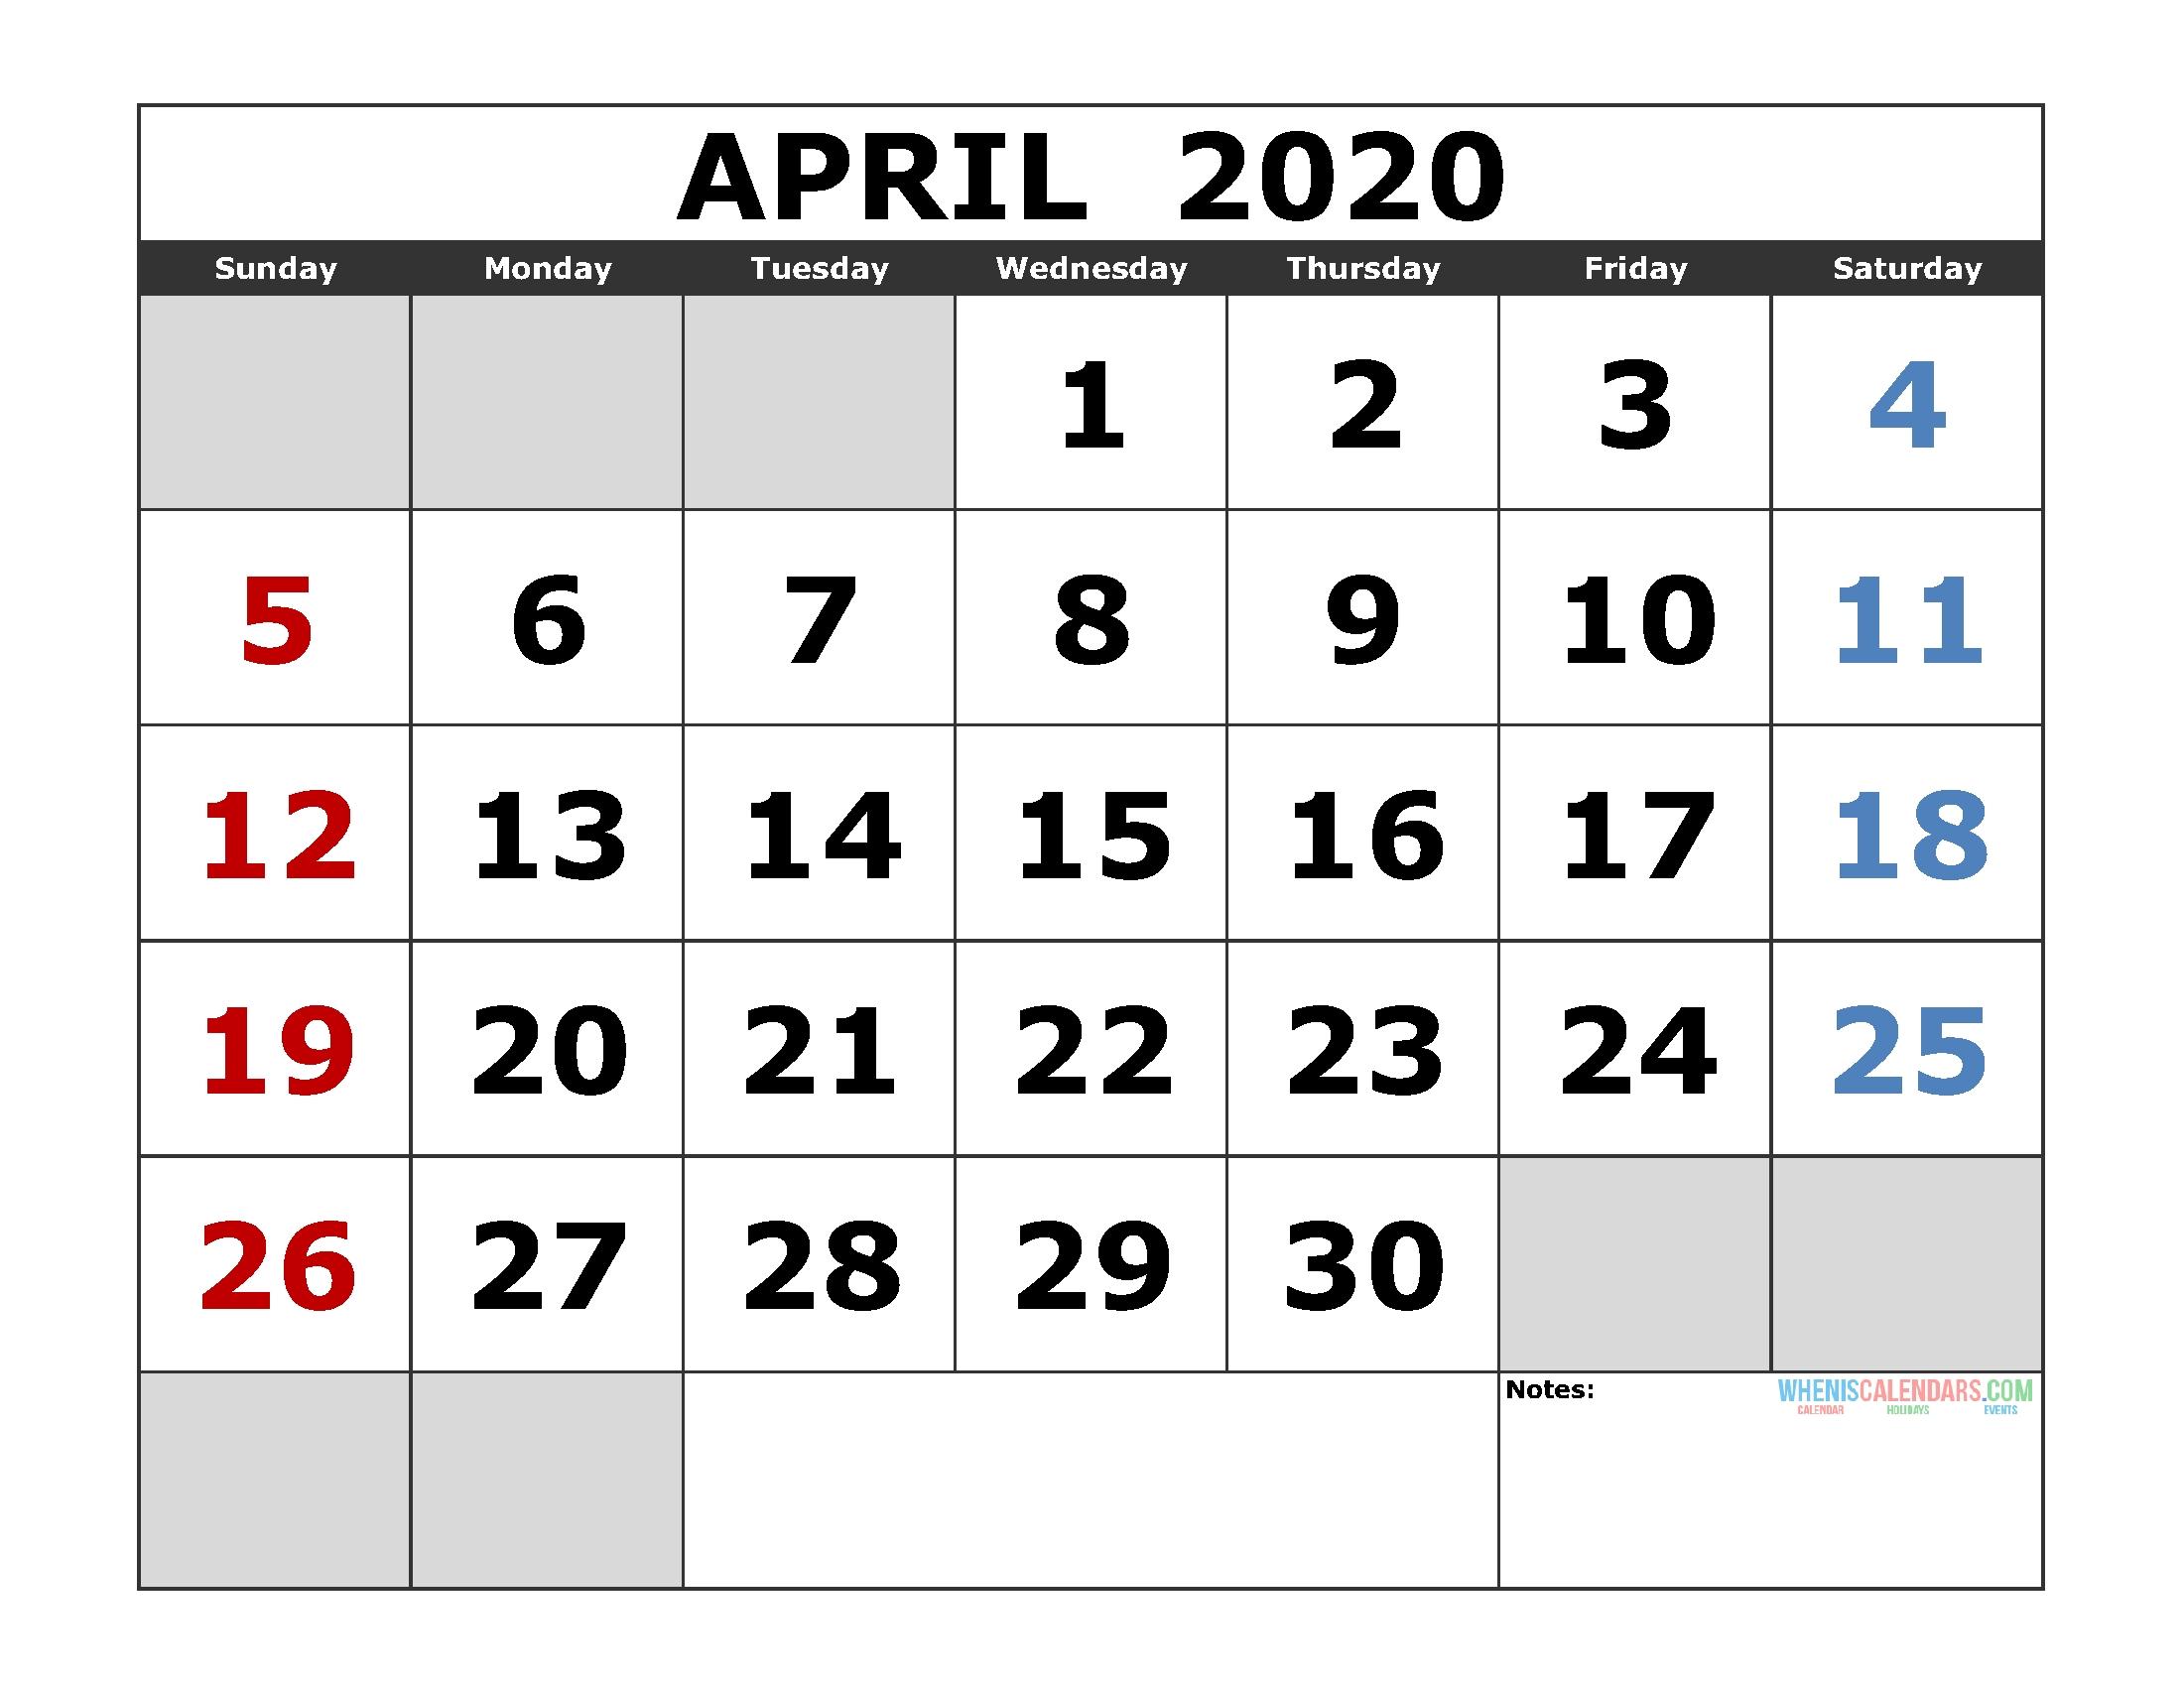 April 2020 Printable Calendar Template Excel, Pdf, Image [Us-April 2020 Jewish Holidays Calendar Print